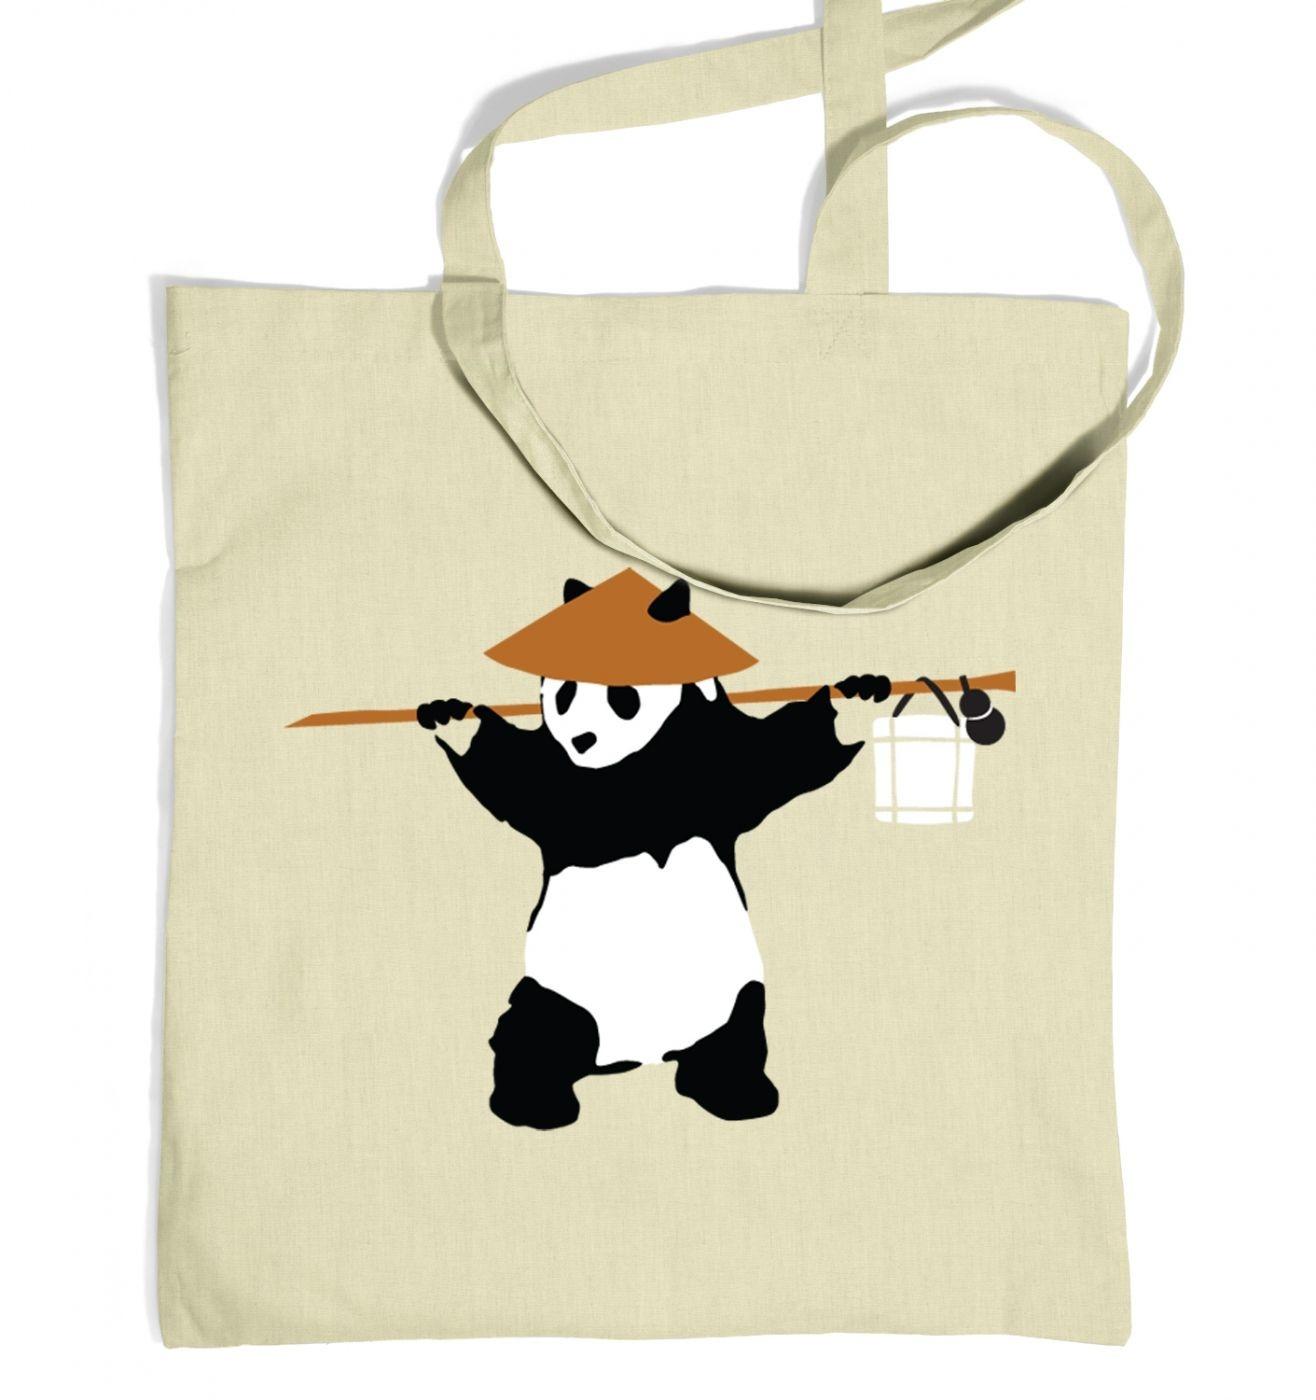 If Banksy Played WoW, He'd Be Pandaren tote bag